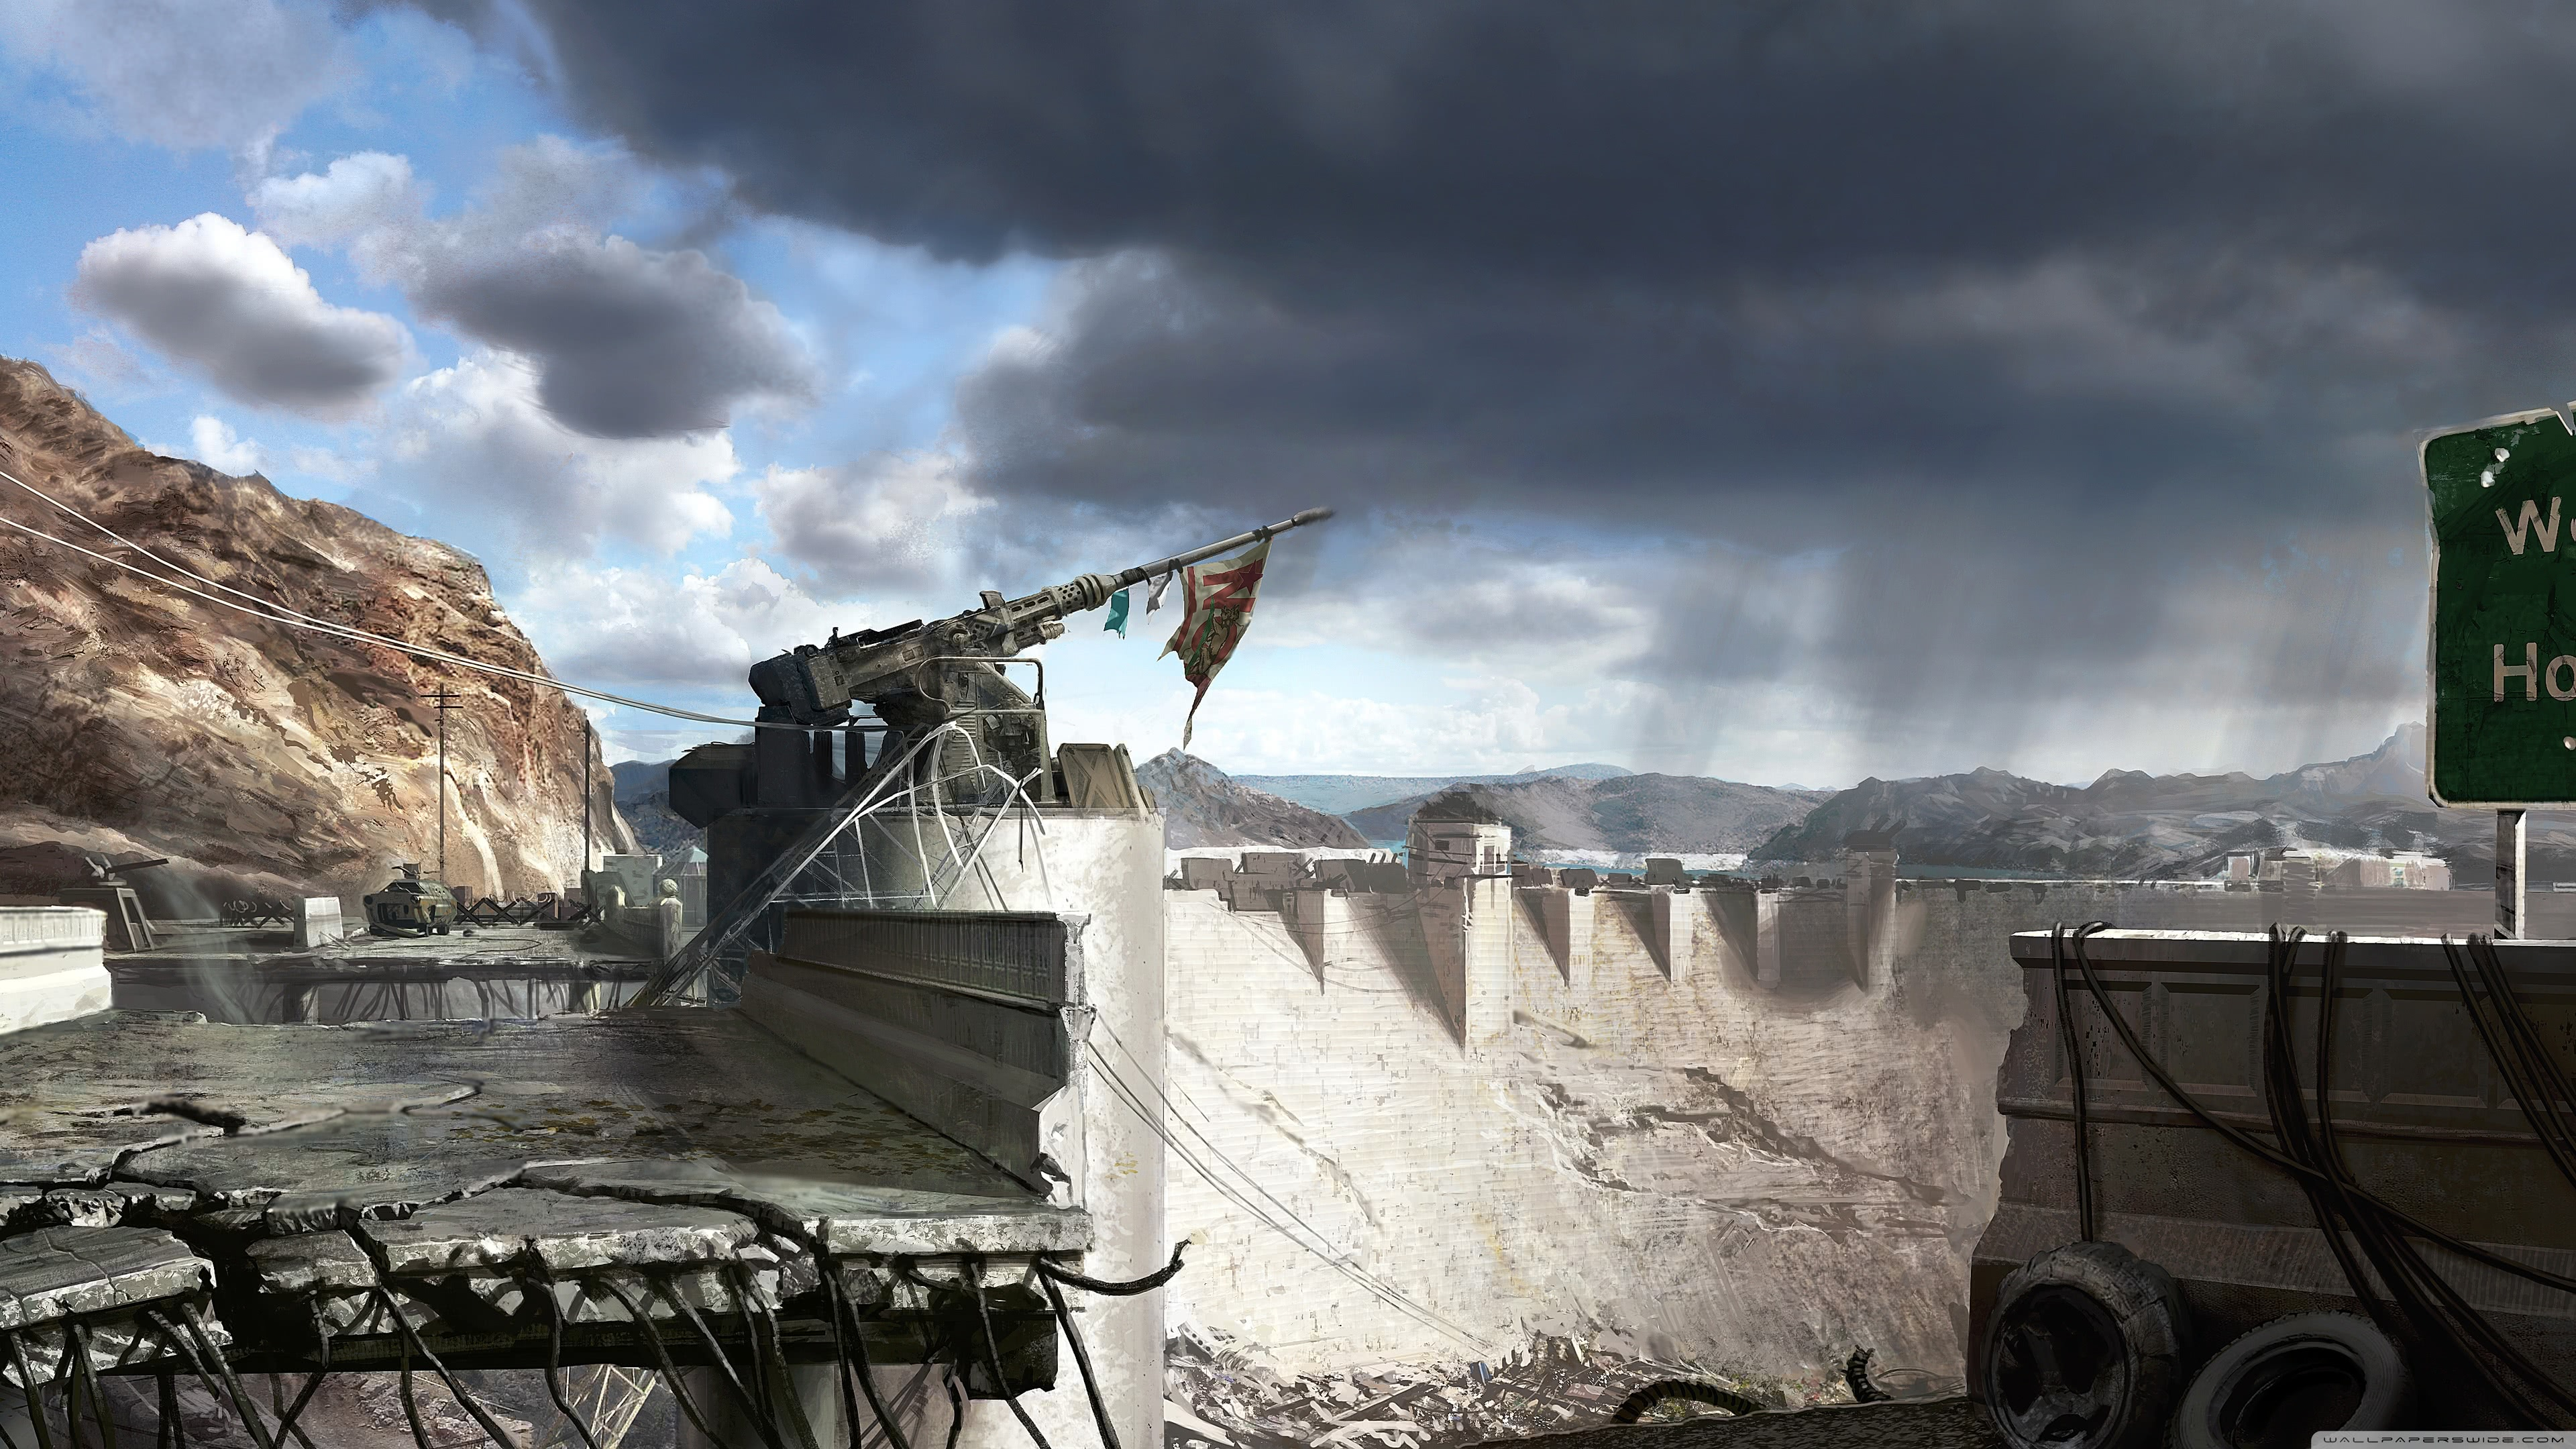 Fallout New Vegas Hoover Dam UHD 4K Wallpaper Pixelz 3840x2160